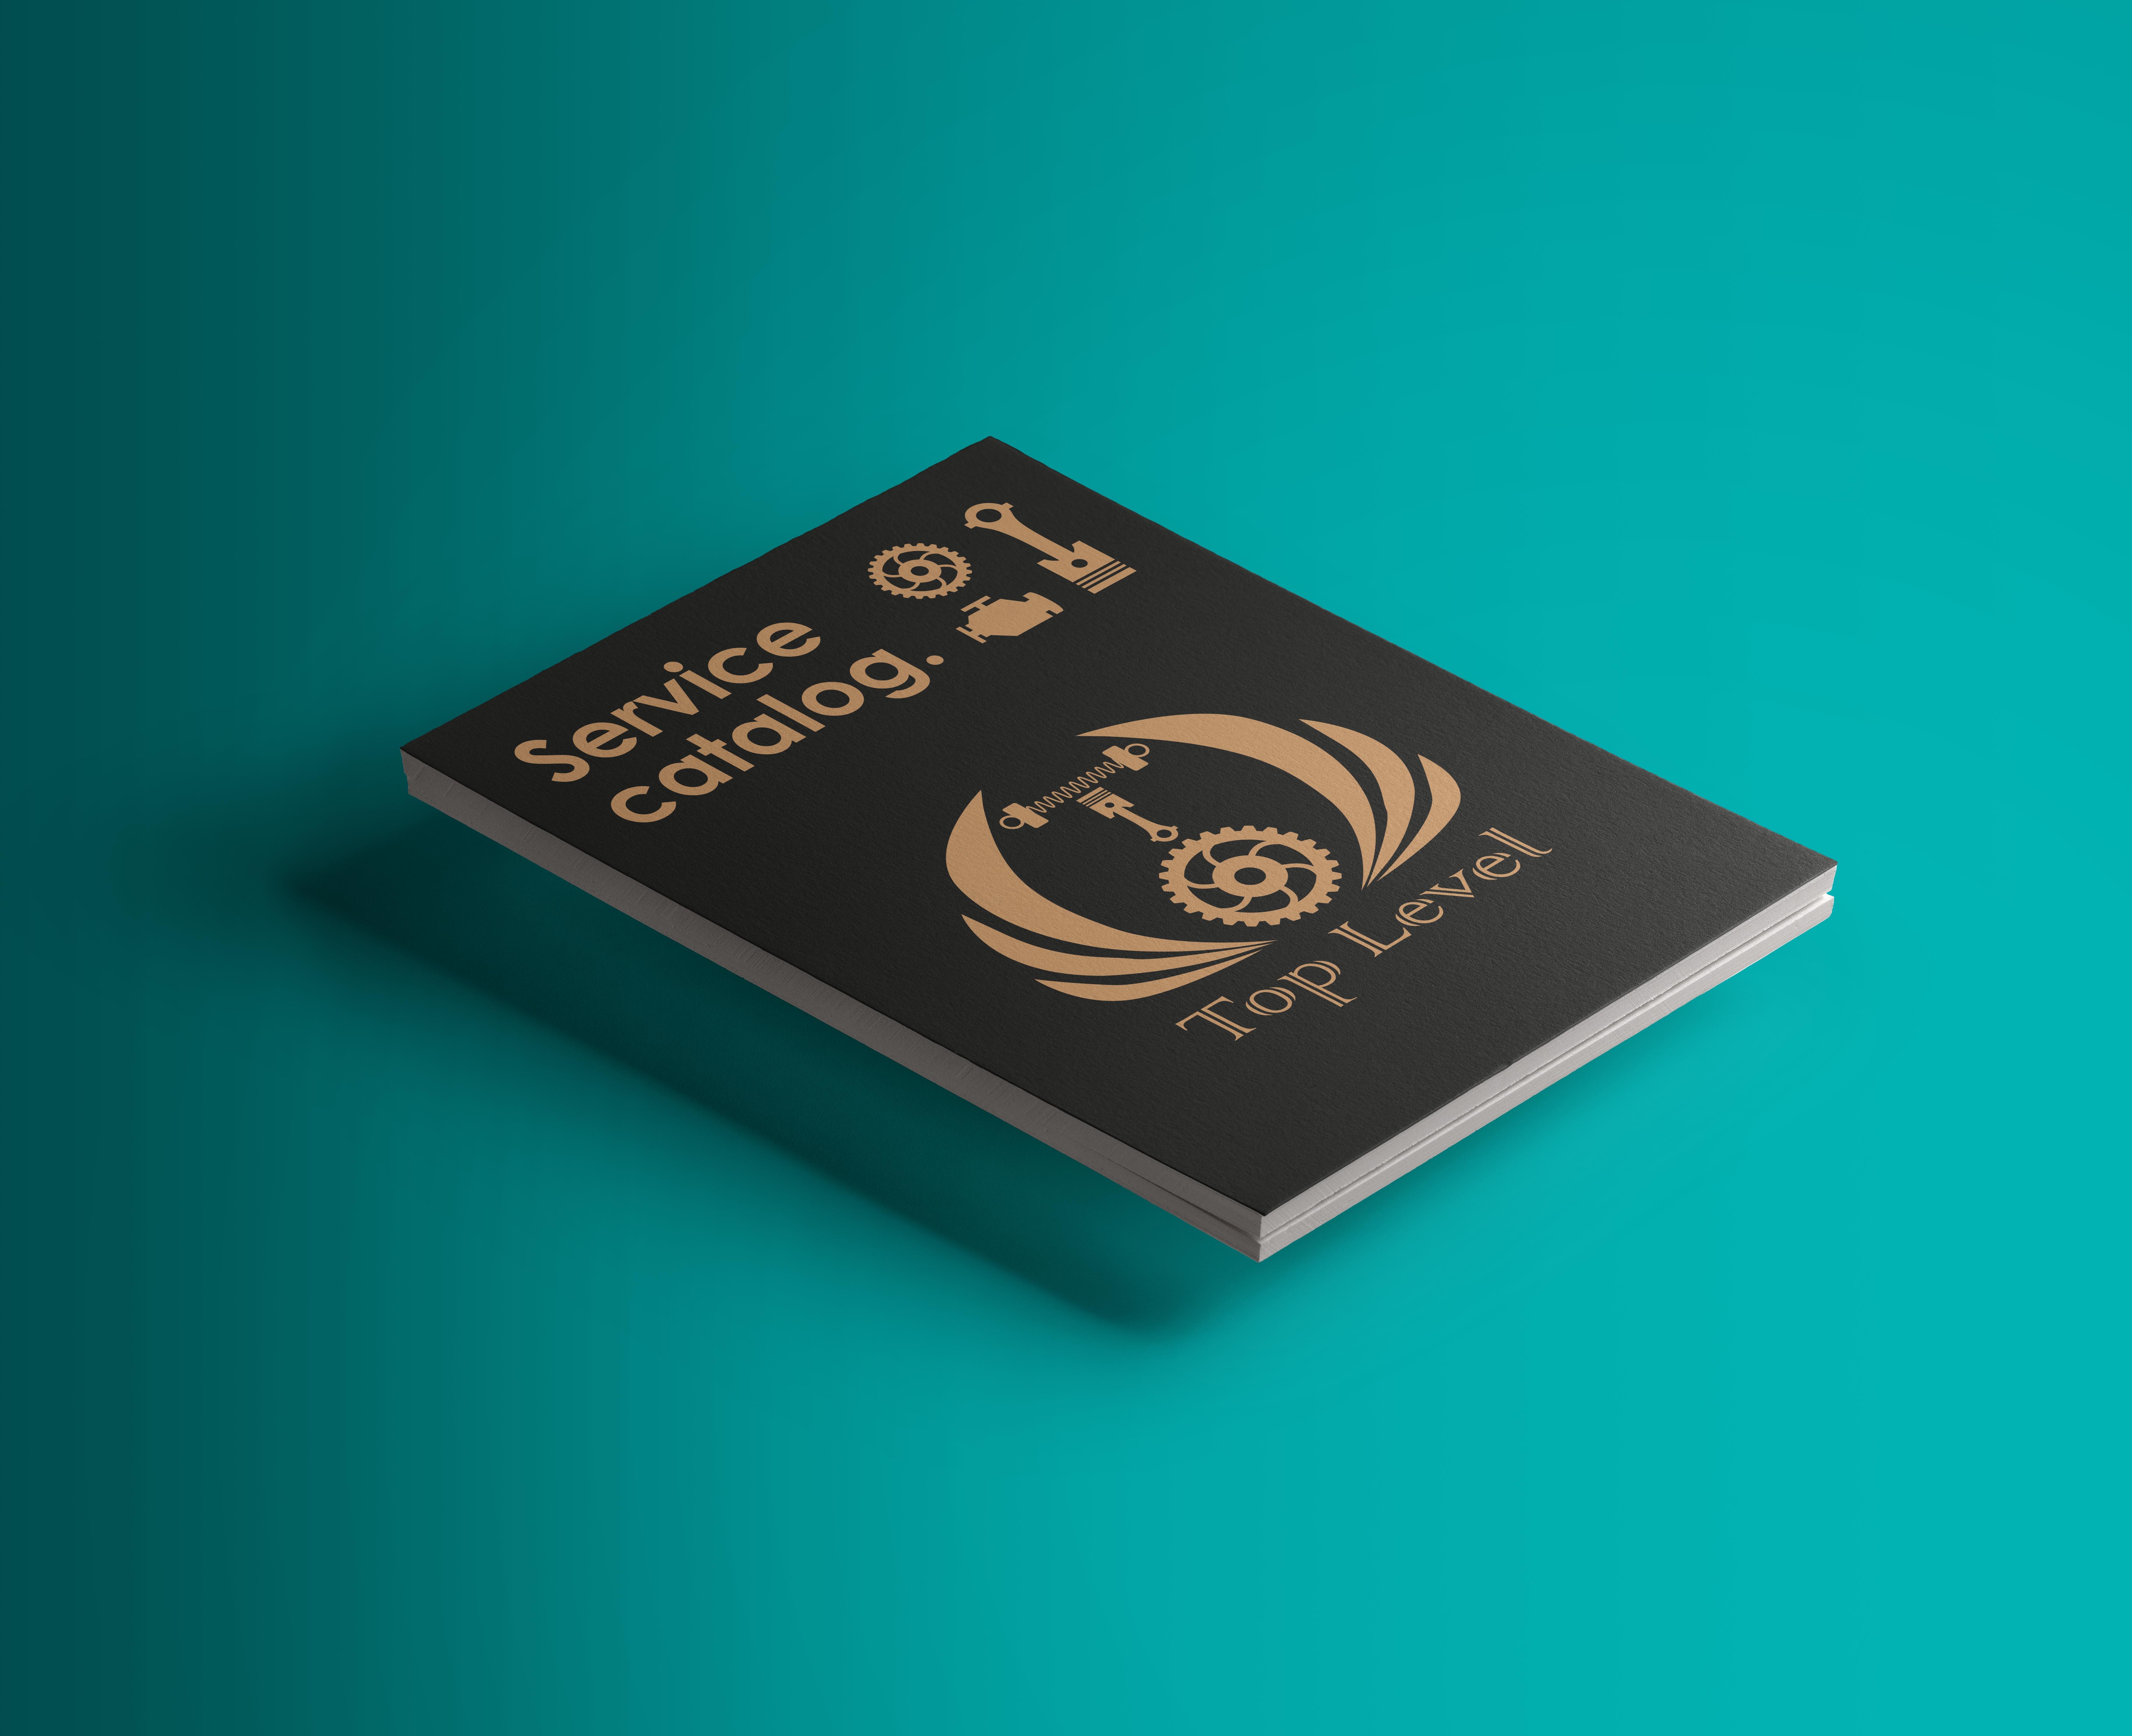 Разработка логотипа для тюнинг ателье фото f_1425f45ba4f66d16.jpg